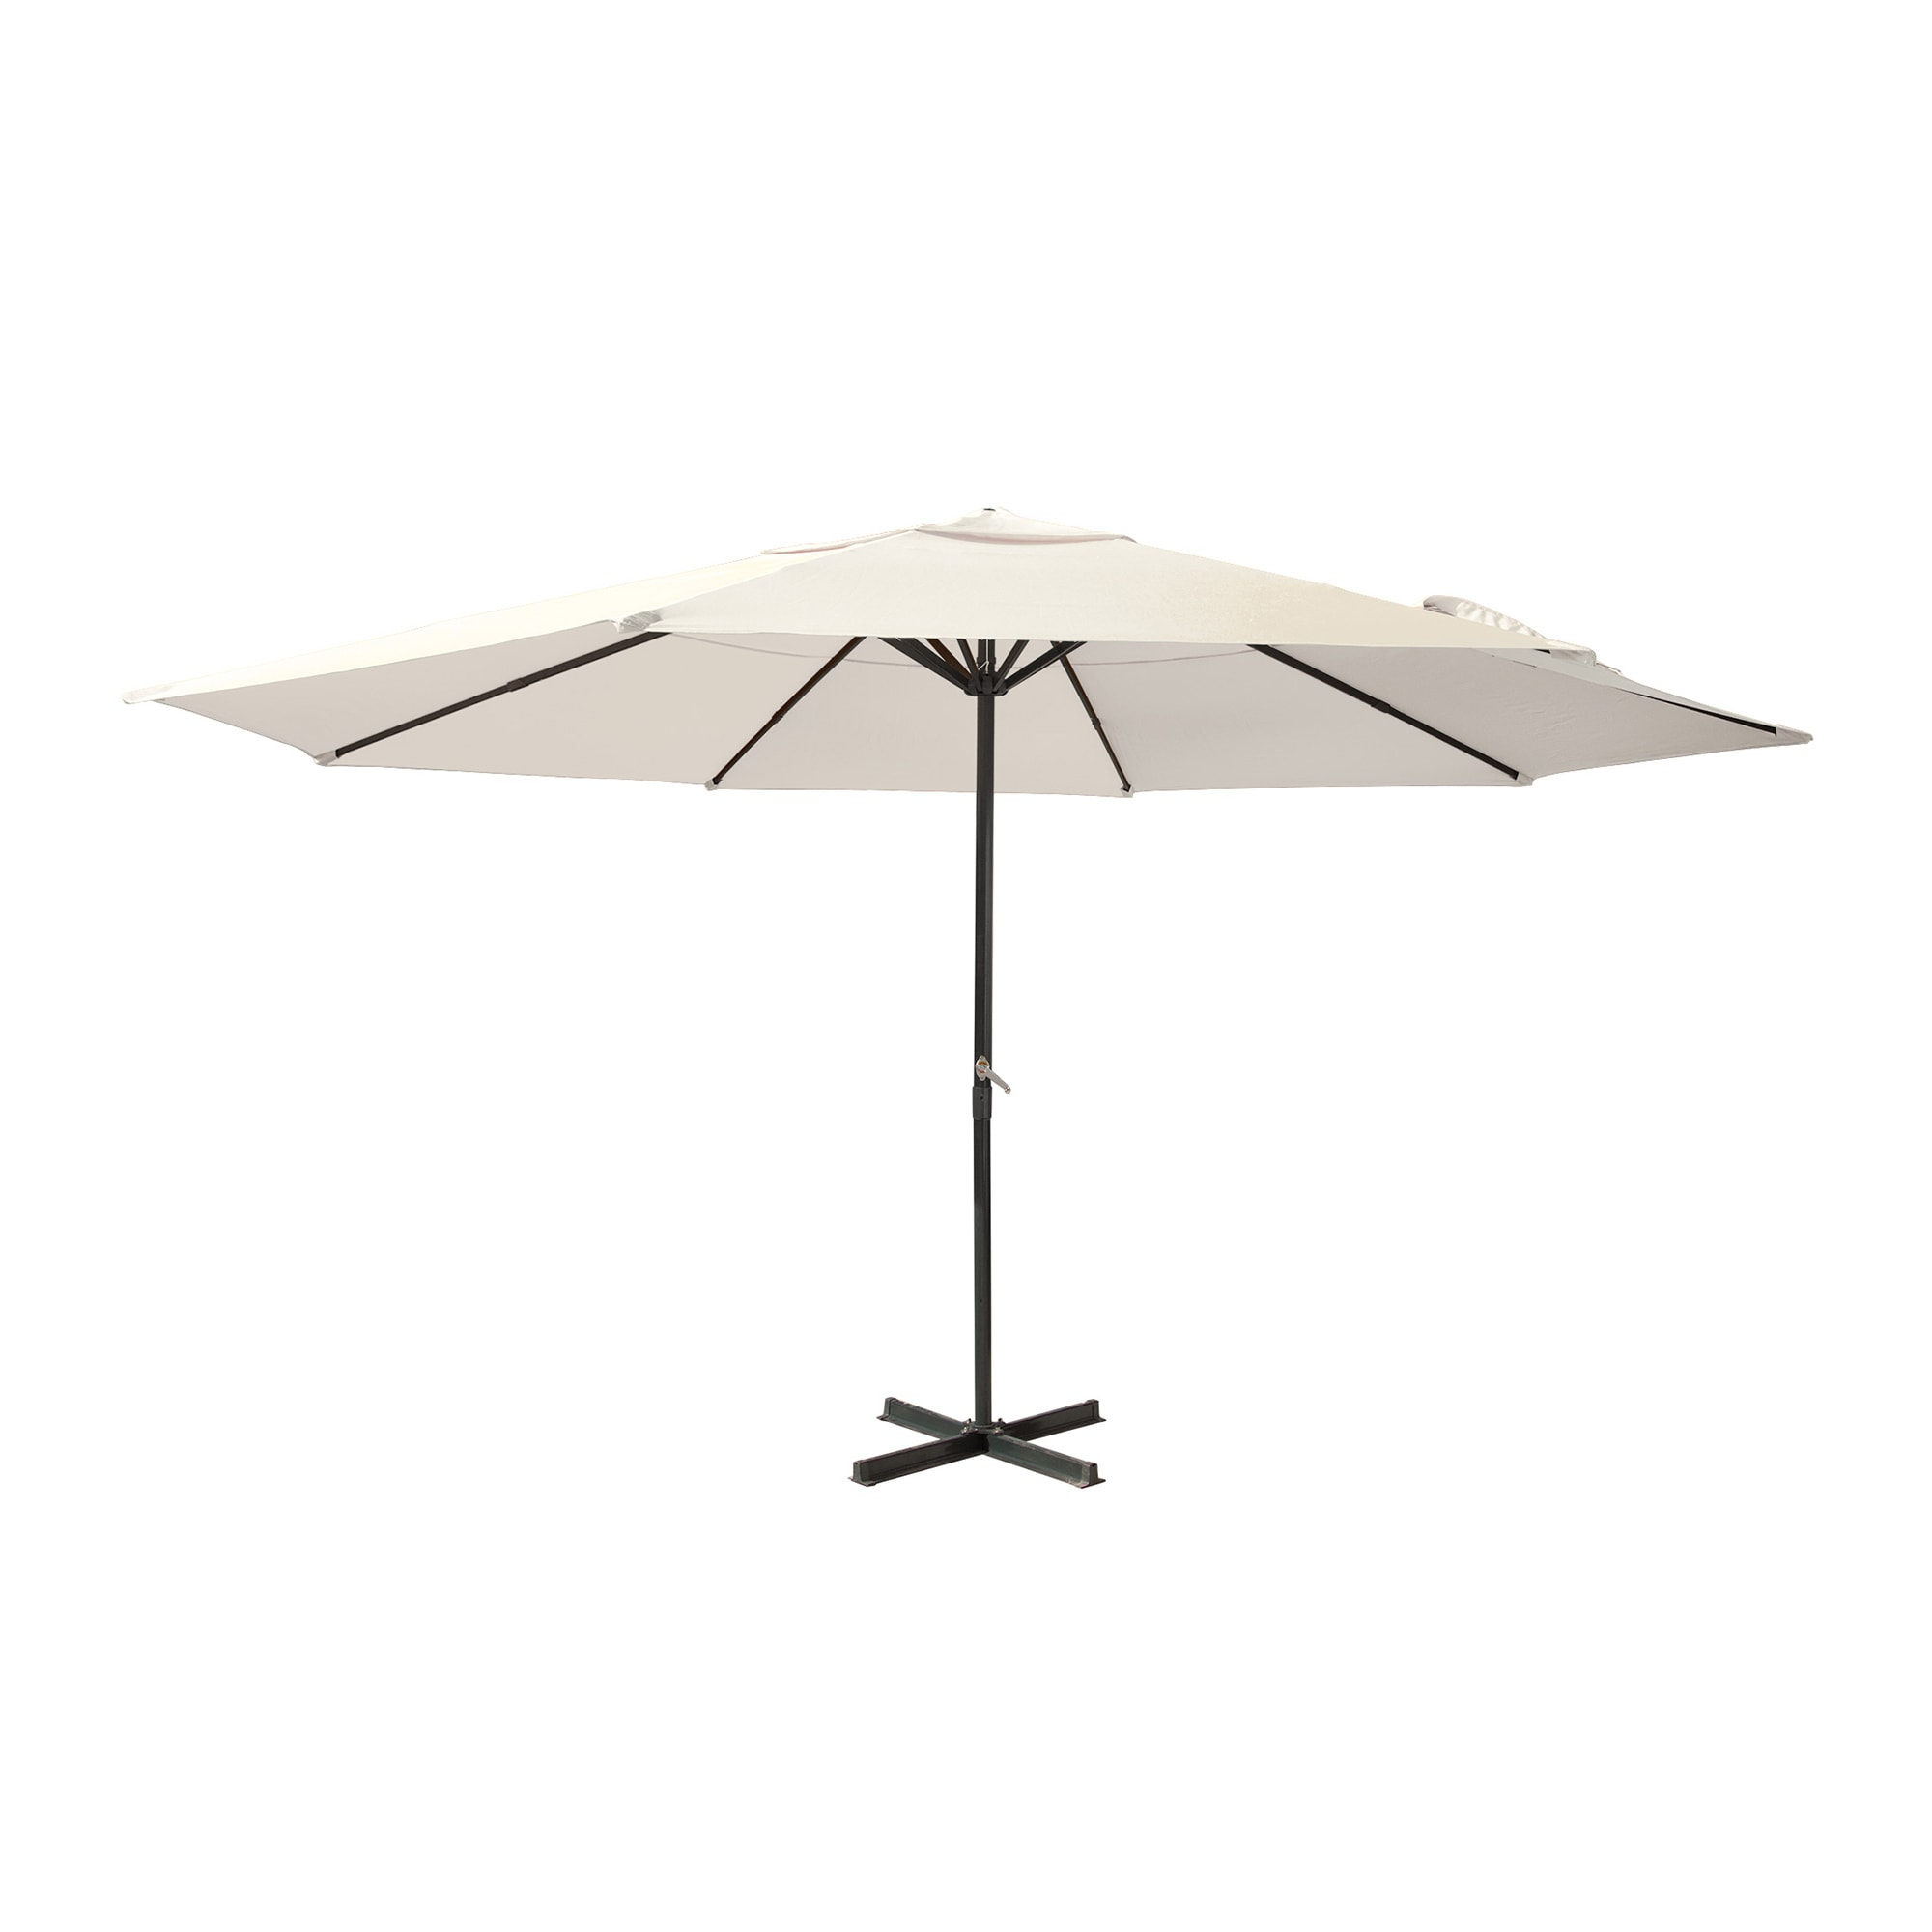 sonnenschirm gro schirm marktschirm gartenschirm wei schirm sonnenschutz ebay. Black Bedroom Furniture Sets. Home Design Ideas